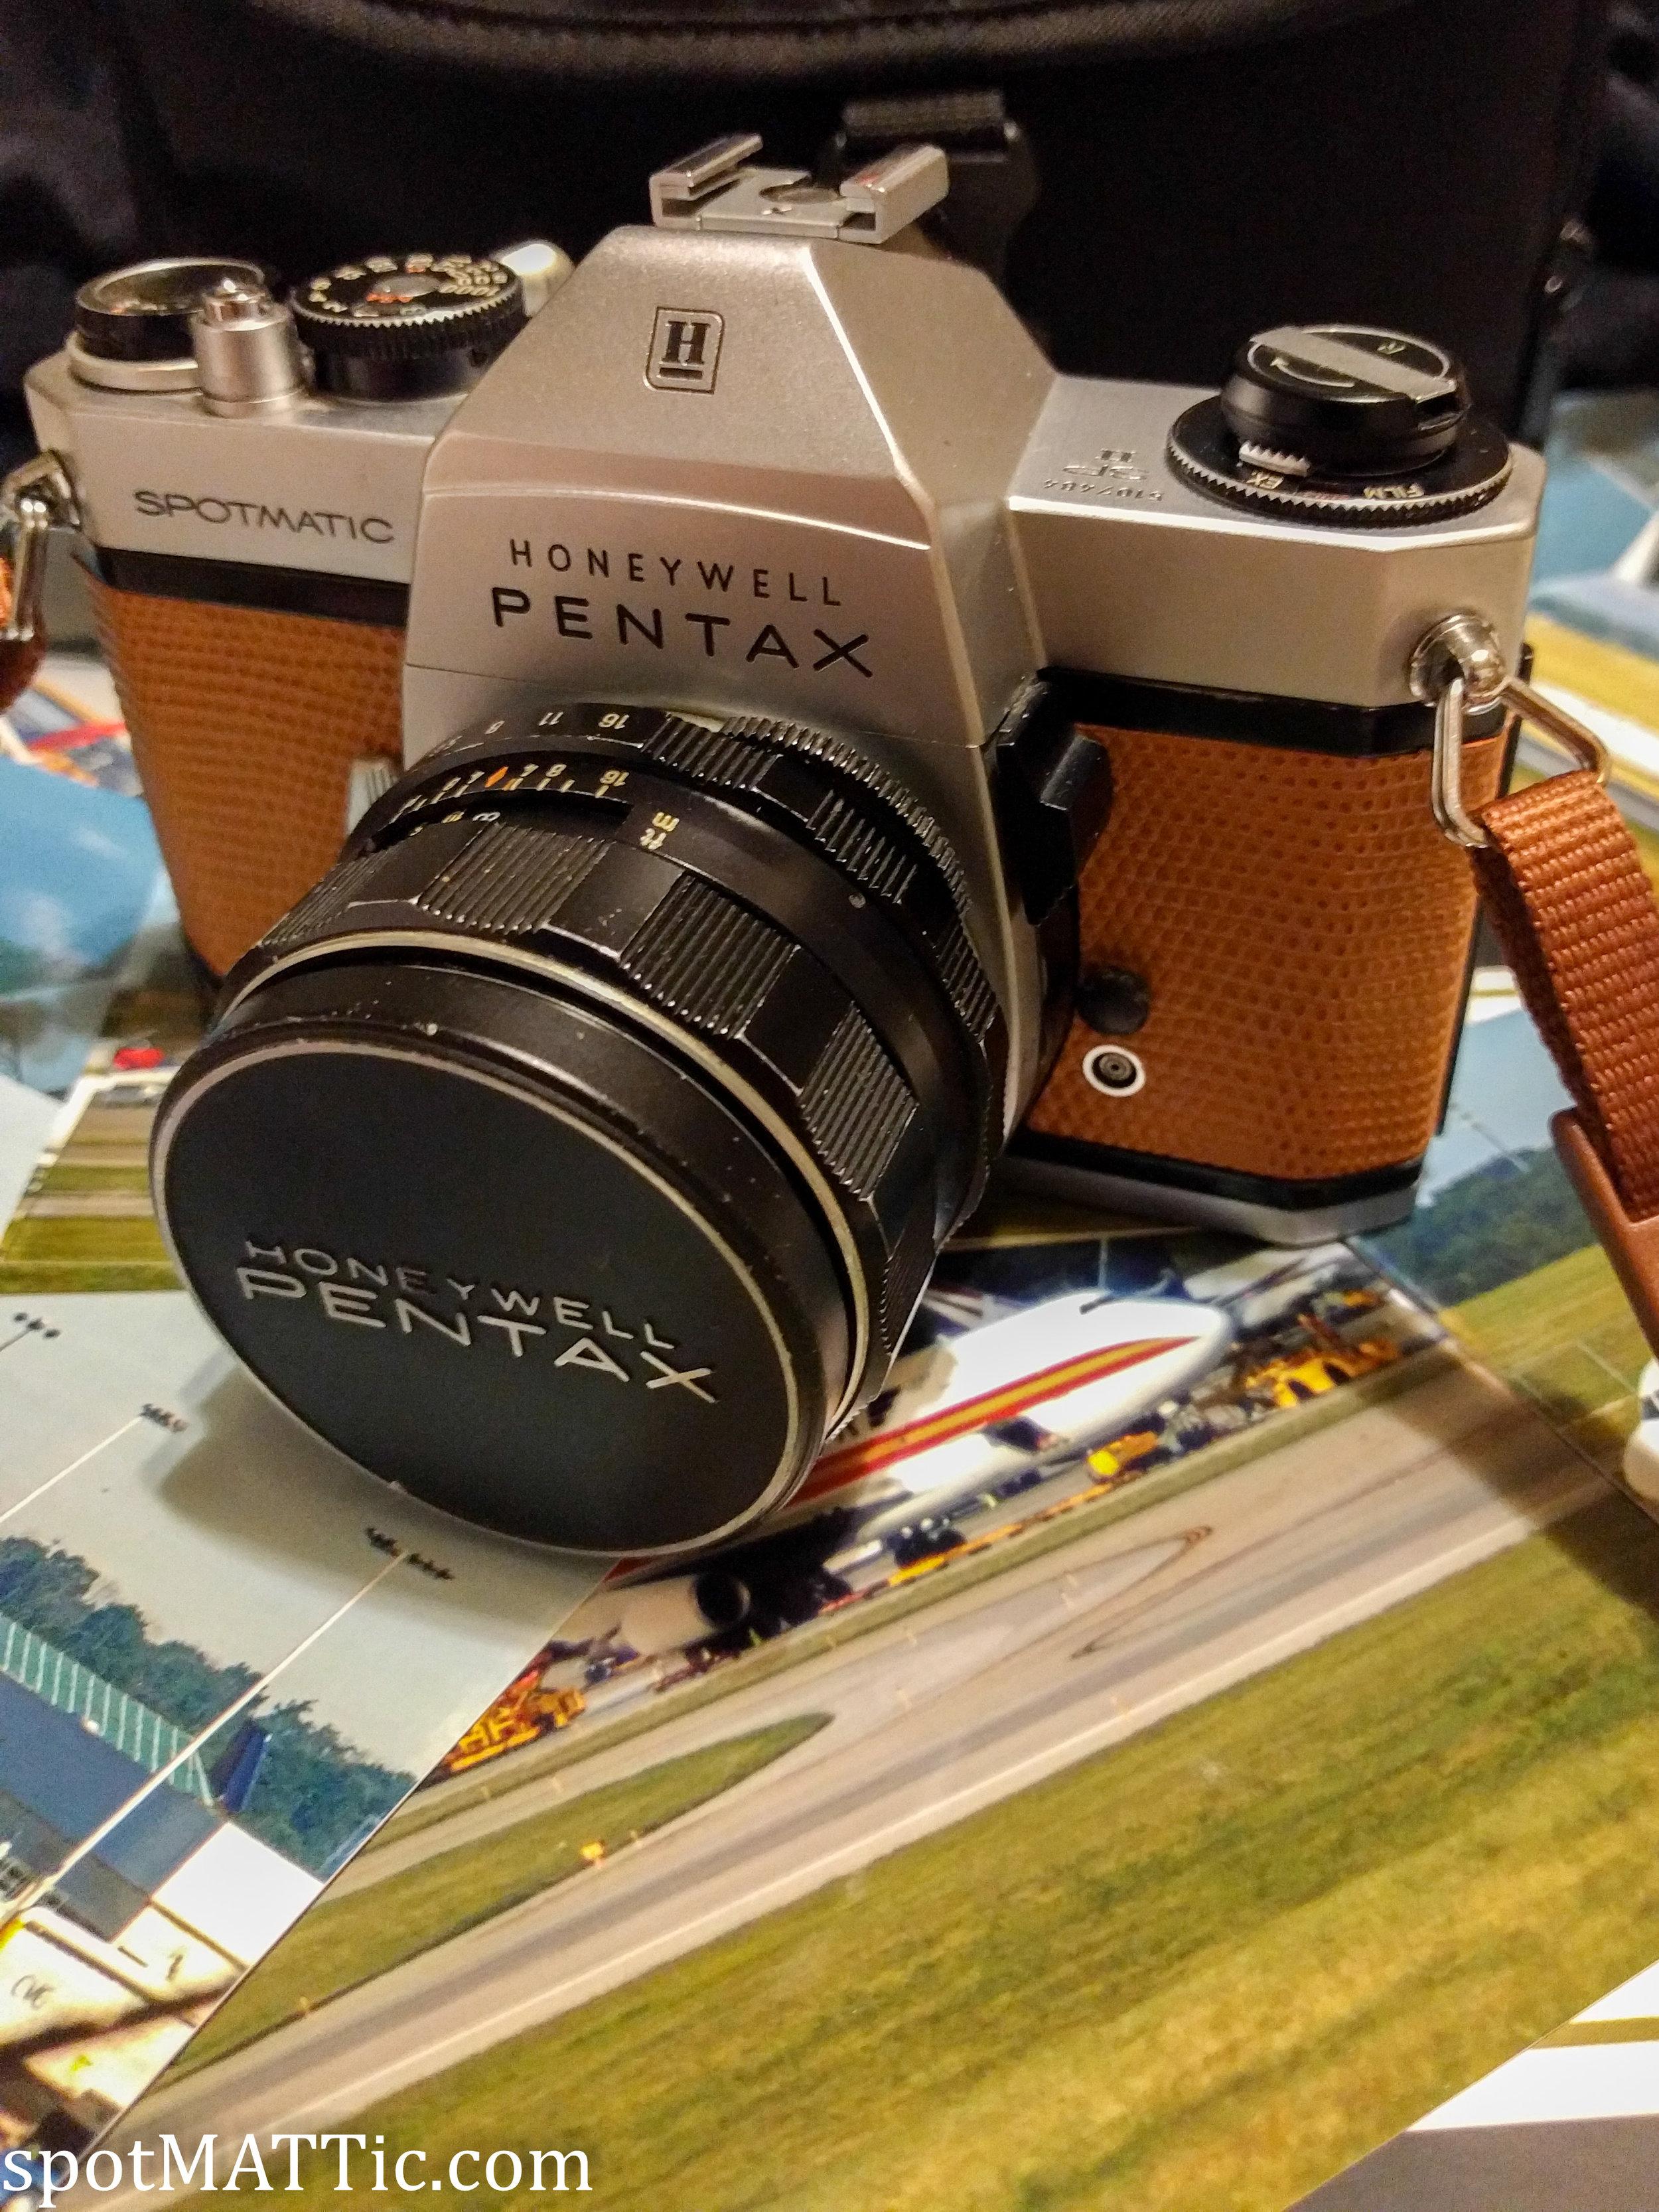 Honeywell Pentax Spotmatic SP II with 50mm F1.4